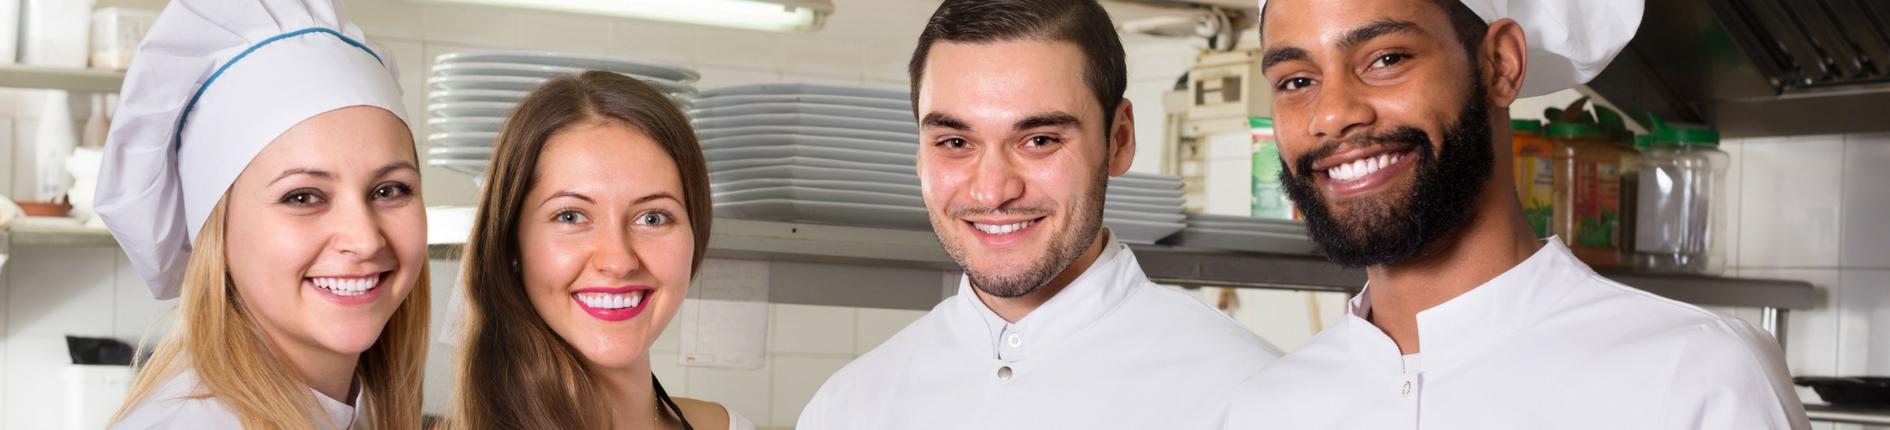 Culinary Arts Training Program - Dorsey Schools